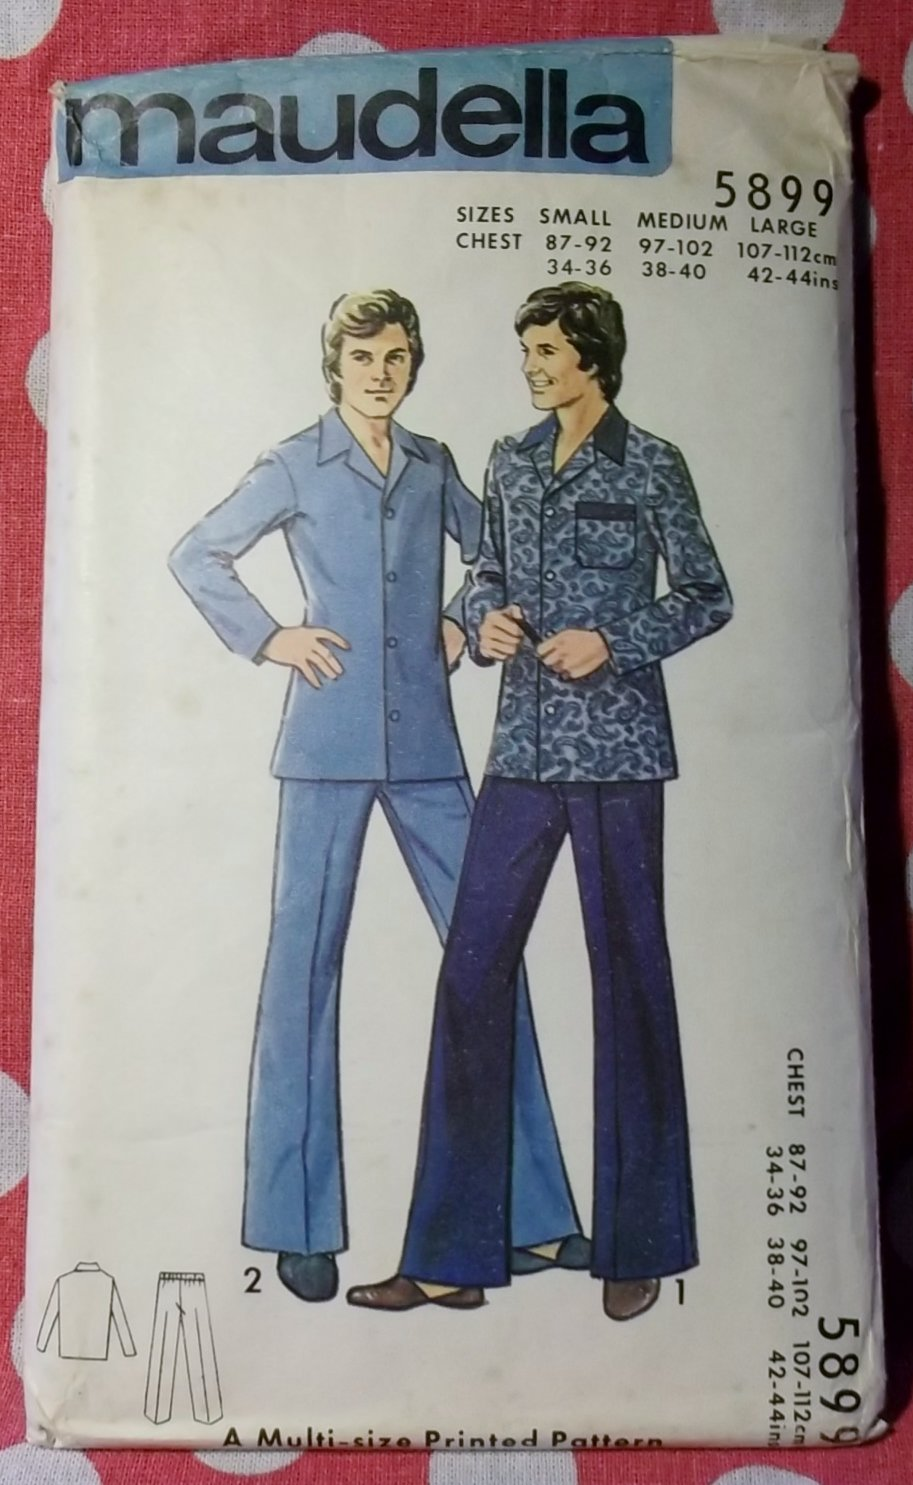 Vintage Maudella 5899 Sewing Pattern, Mens Pyjamas, Sz Sm Md Lg, Uncut